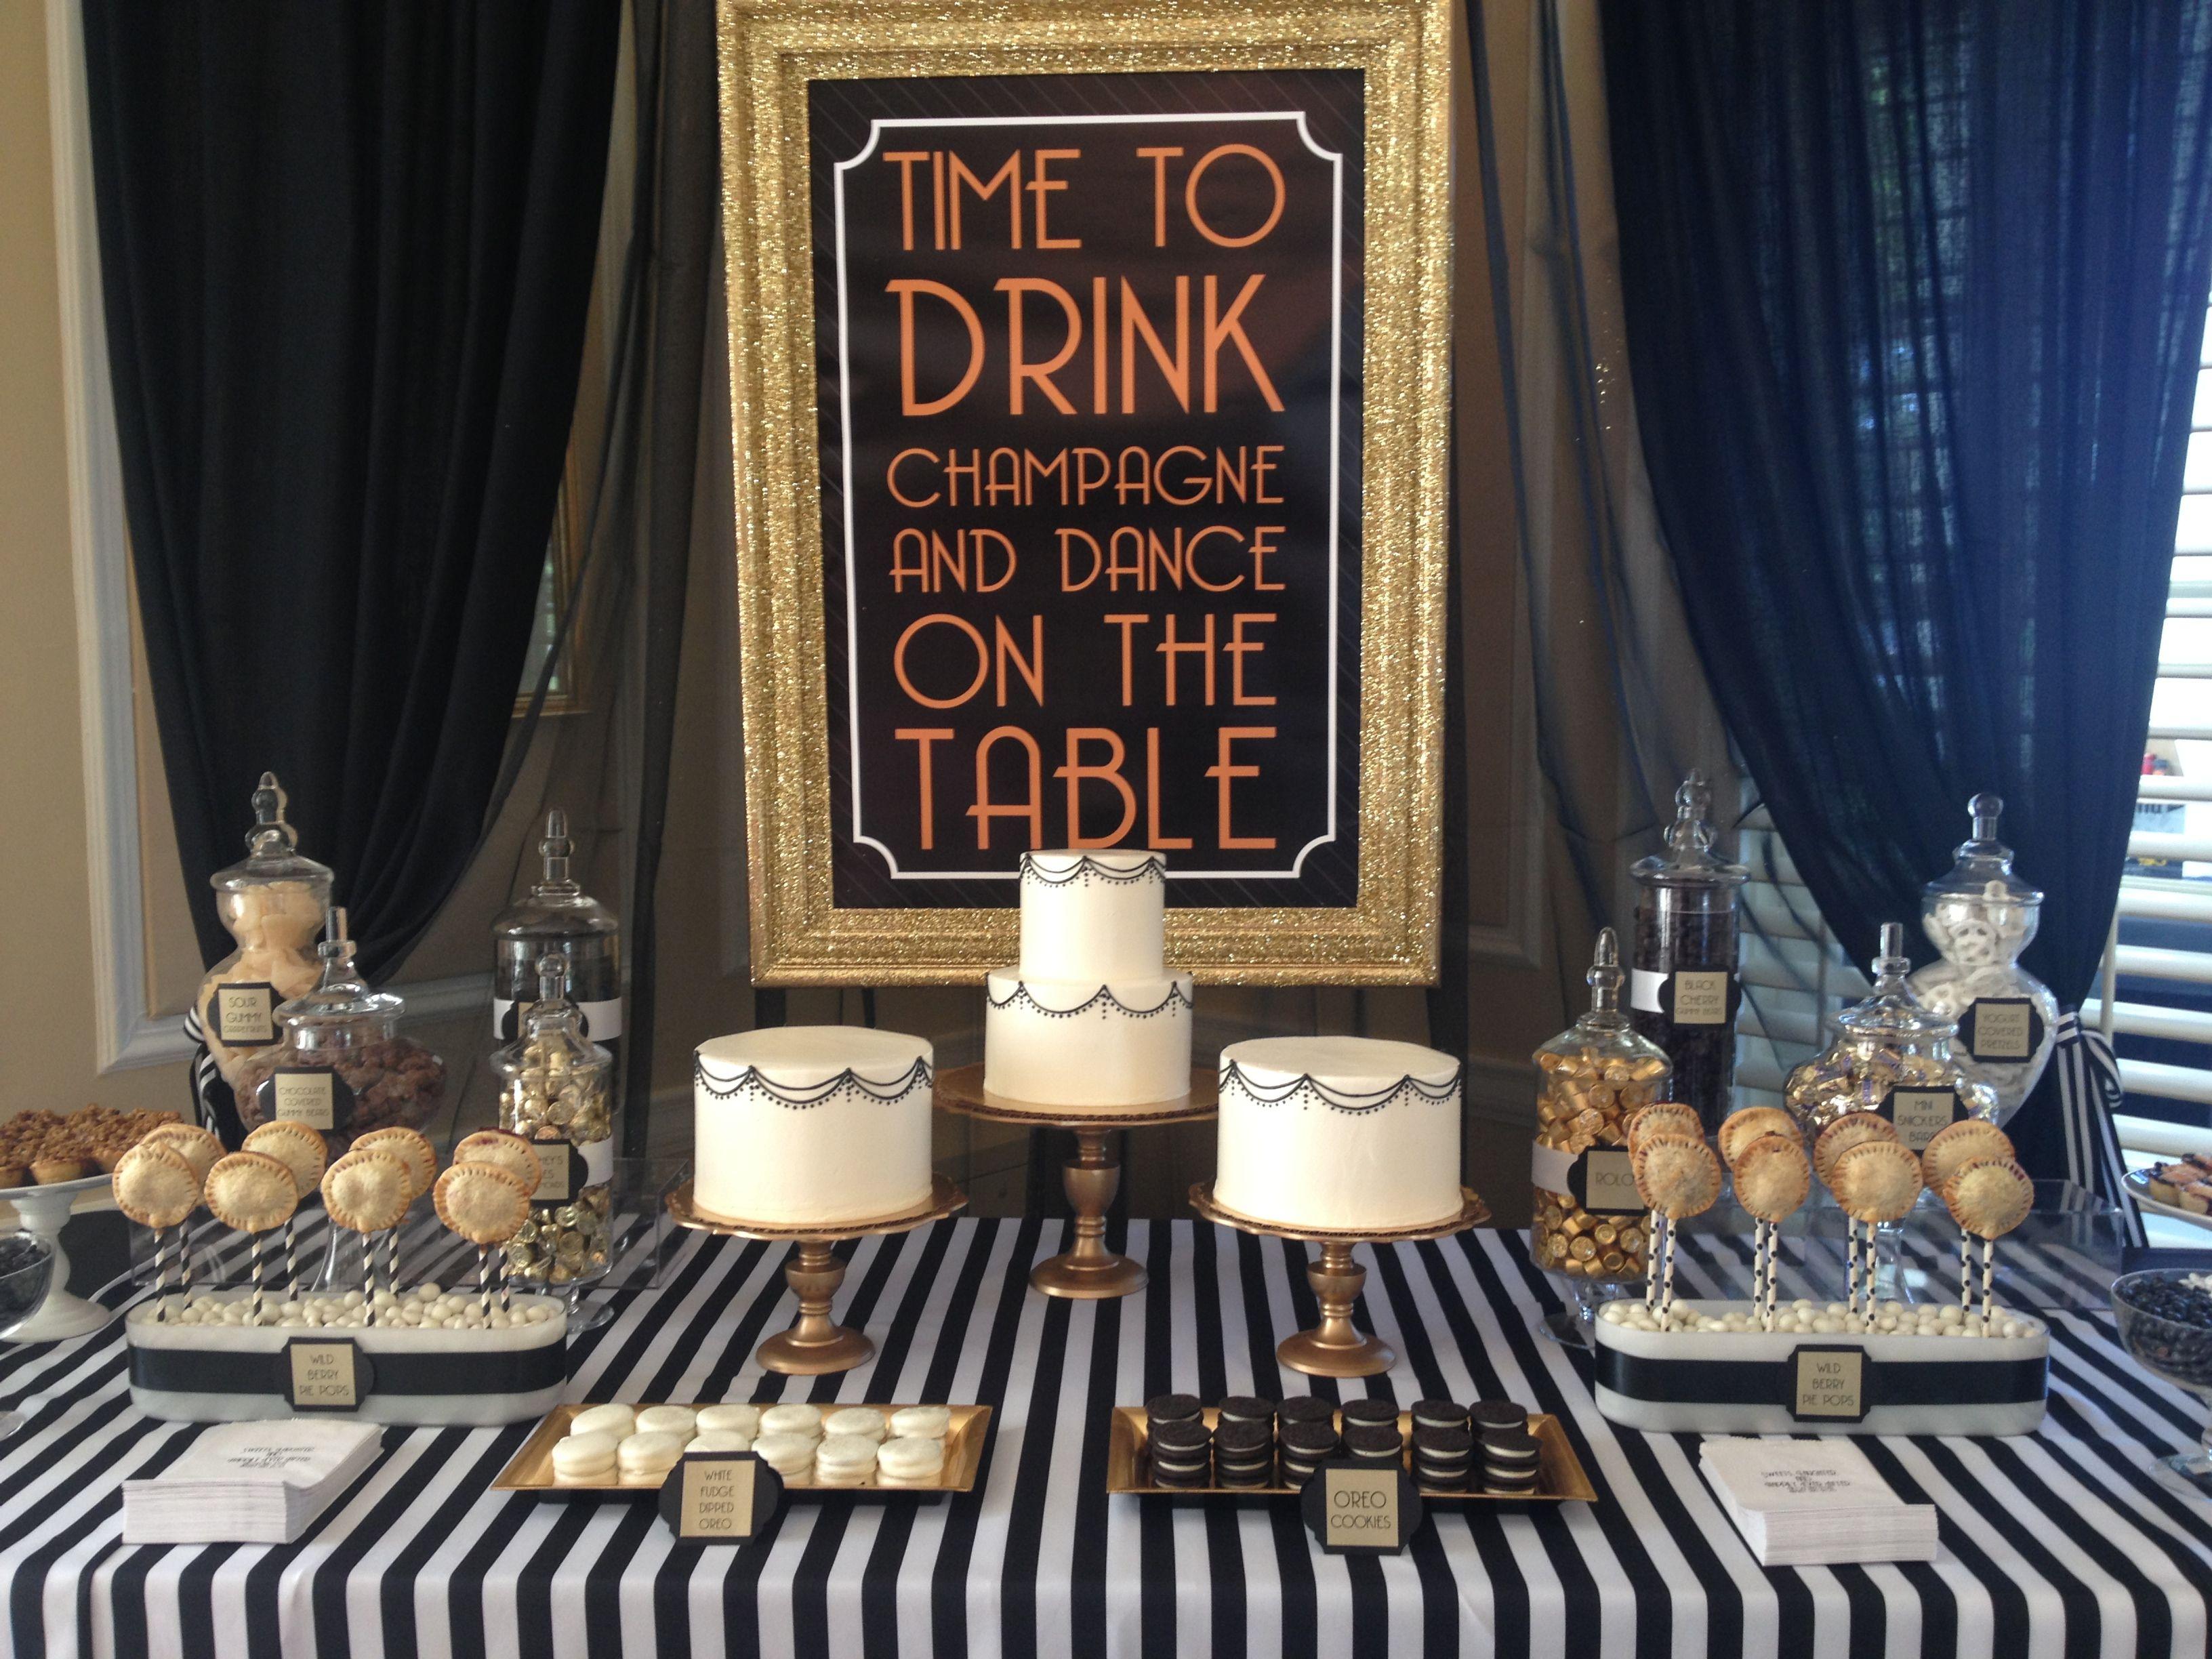 Pin by Heather Seethoff on Blissfully Sweet PDX Dessert Buffets | Dessert  display, Dessert table, Wedding deco